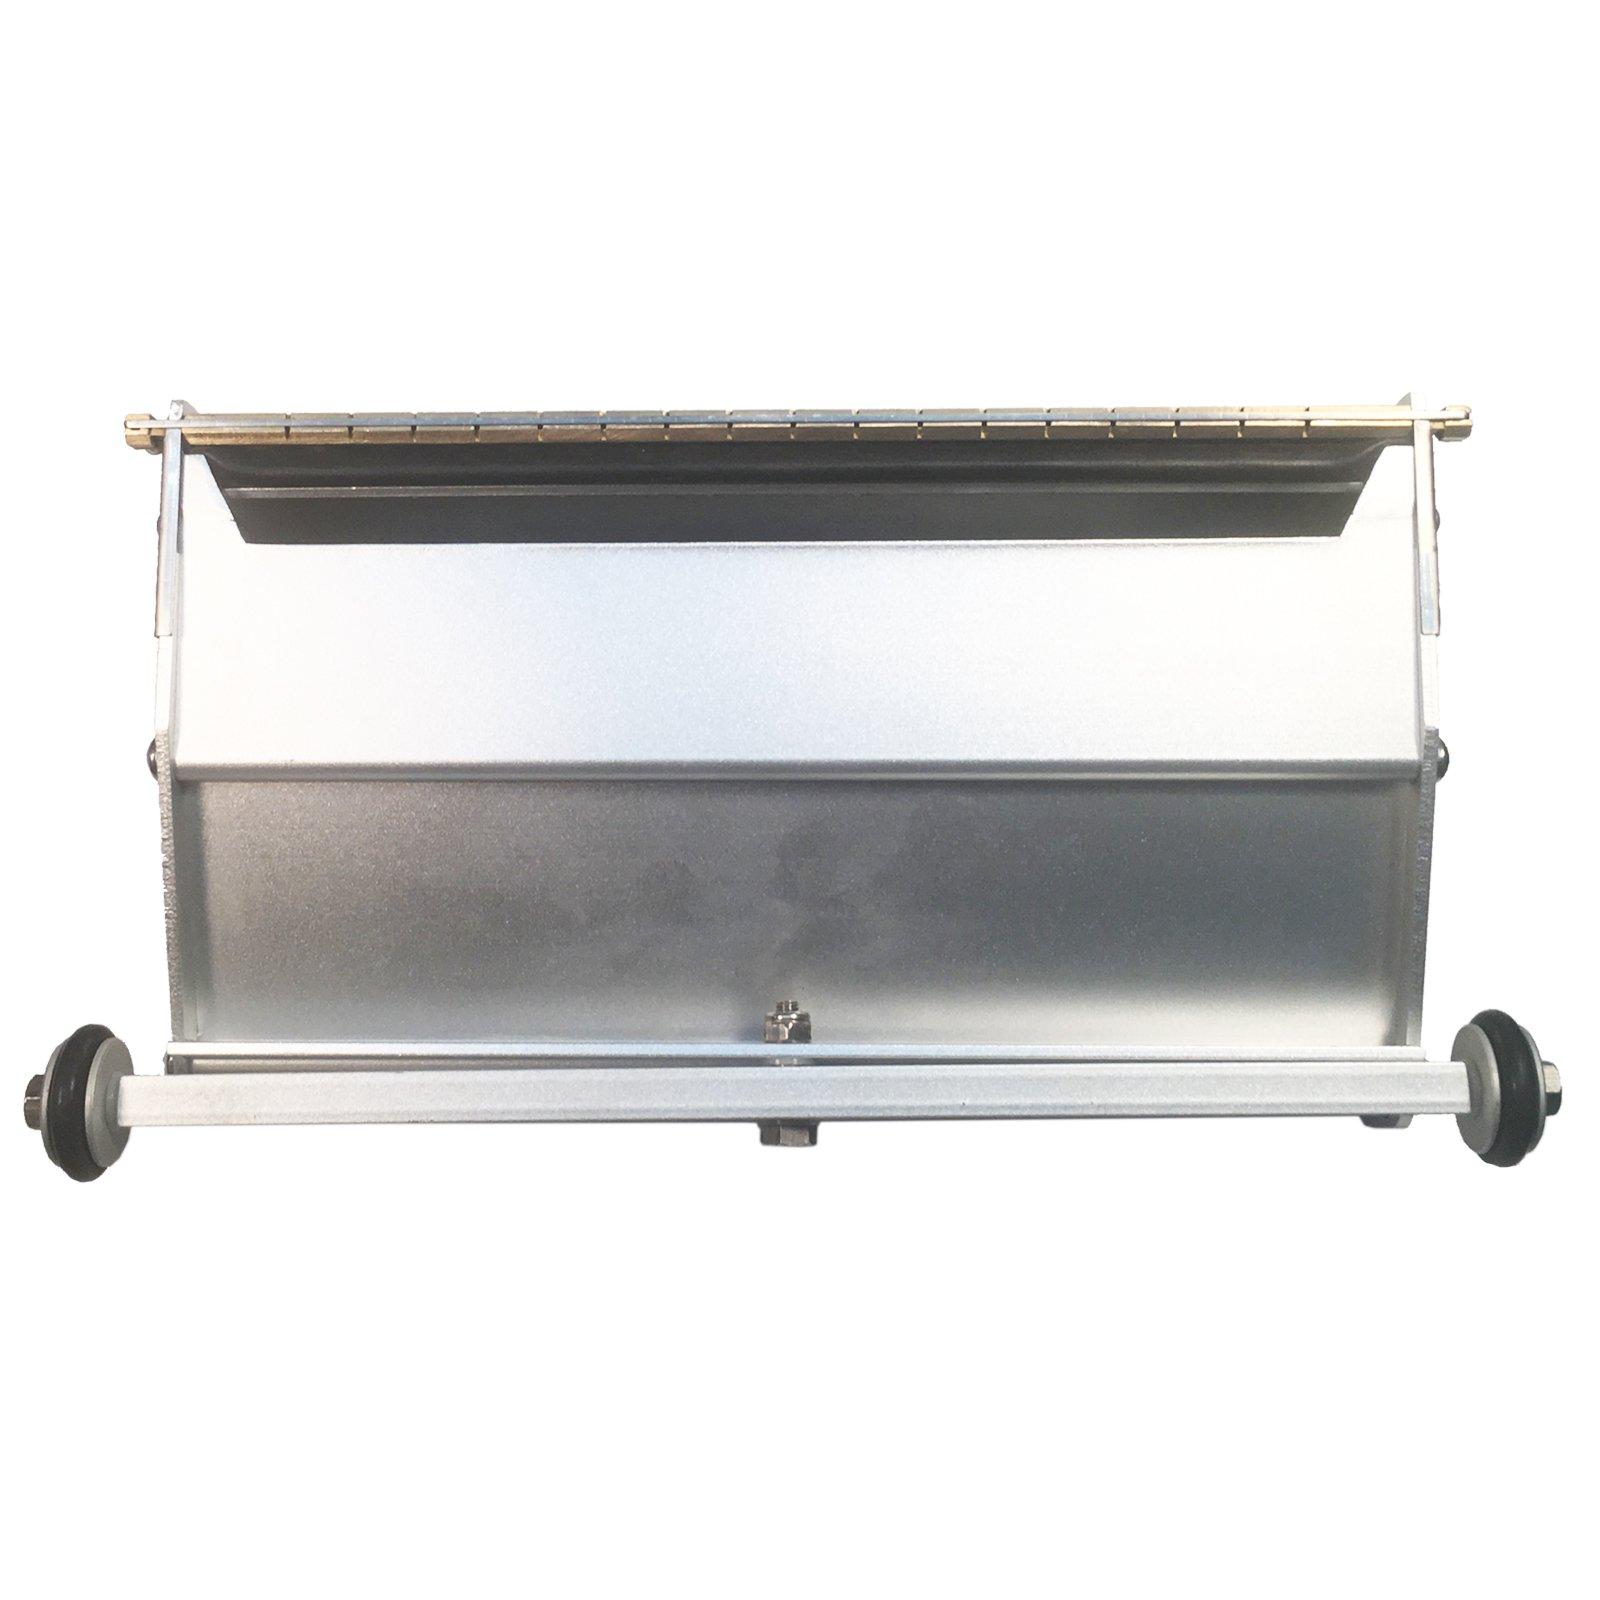 Platinum Drywall Tools 8'' Drywall Flat Finishing Box